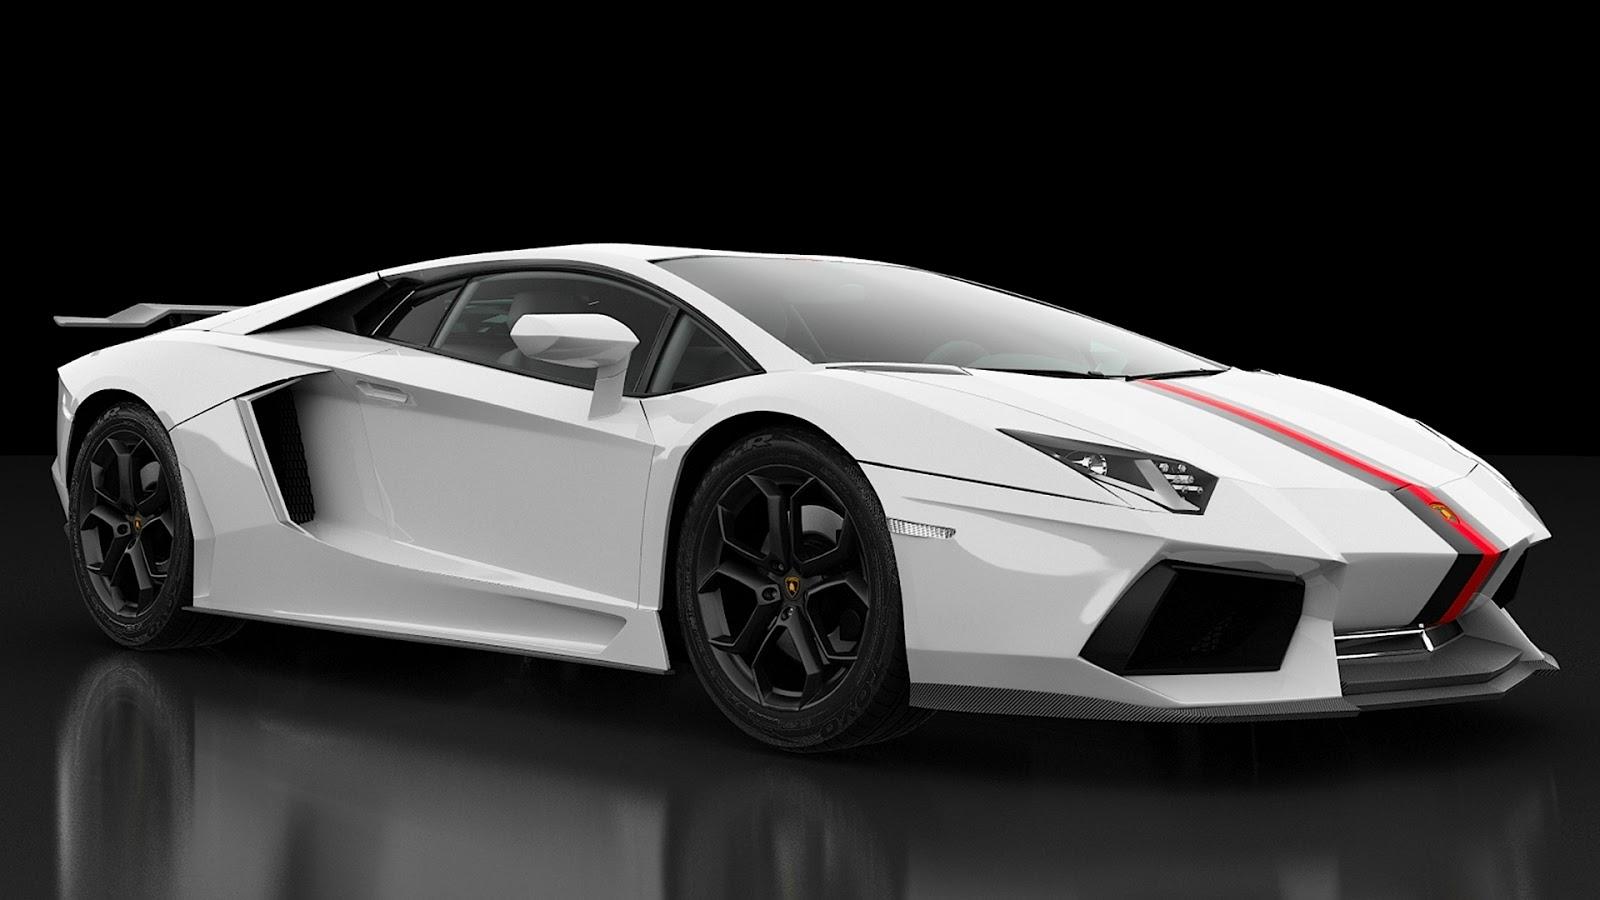 Luxury Lamborghini Cars Lamborghini Aventador White - Cool lamborghini cars